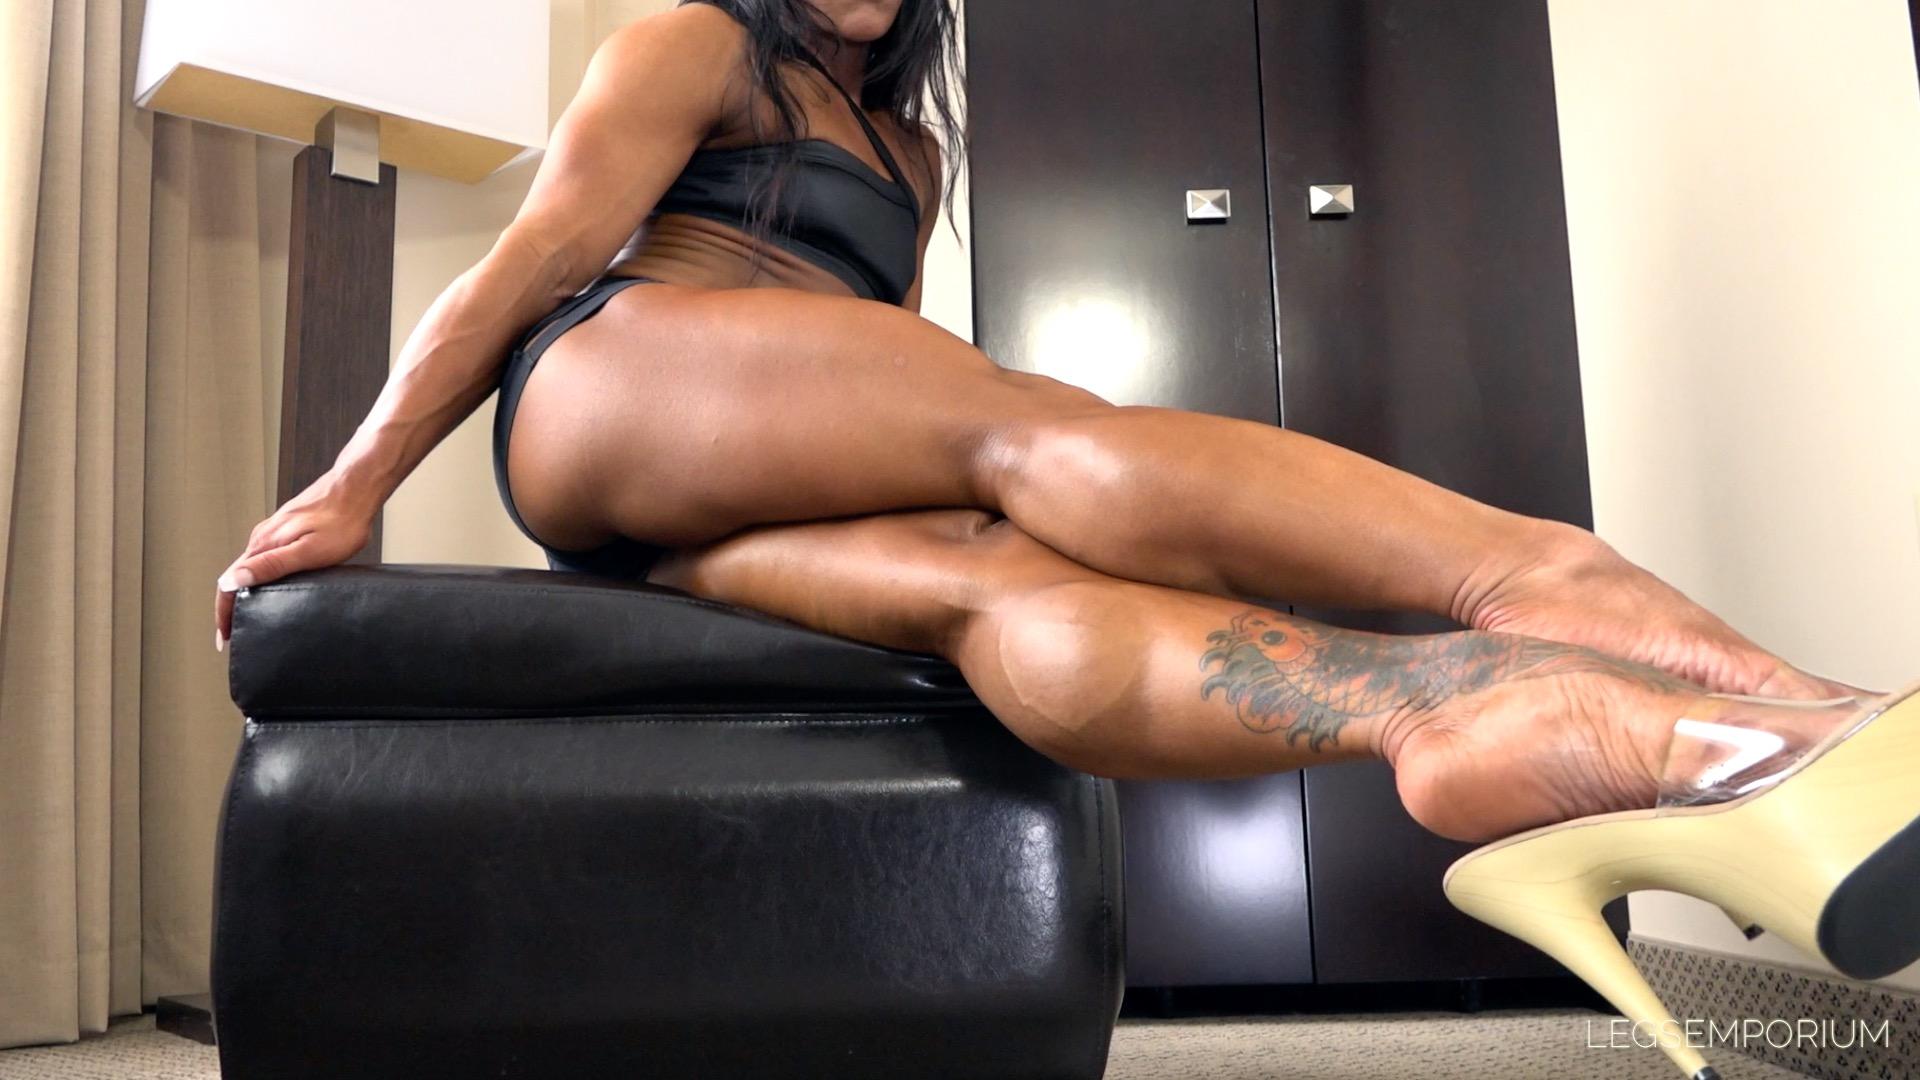 Hot muscle legs in black pantyhose and heels